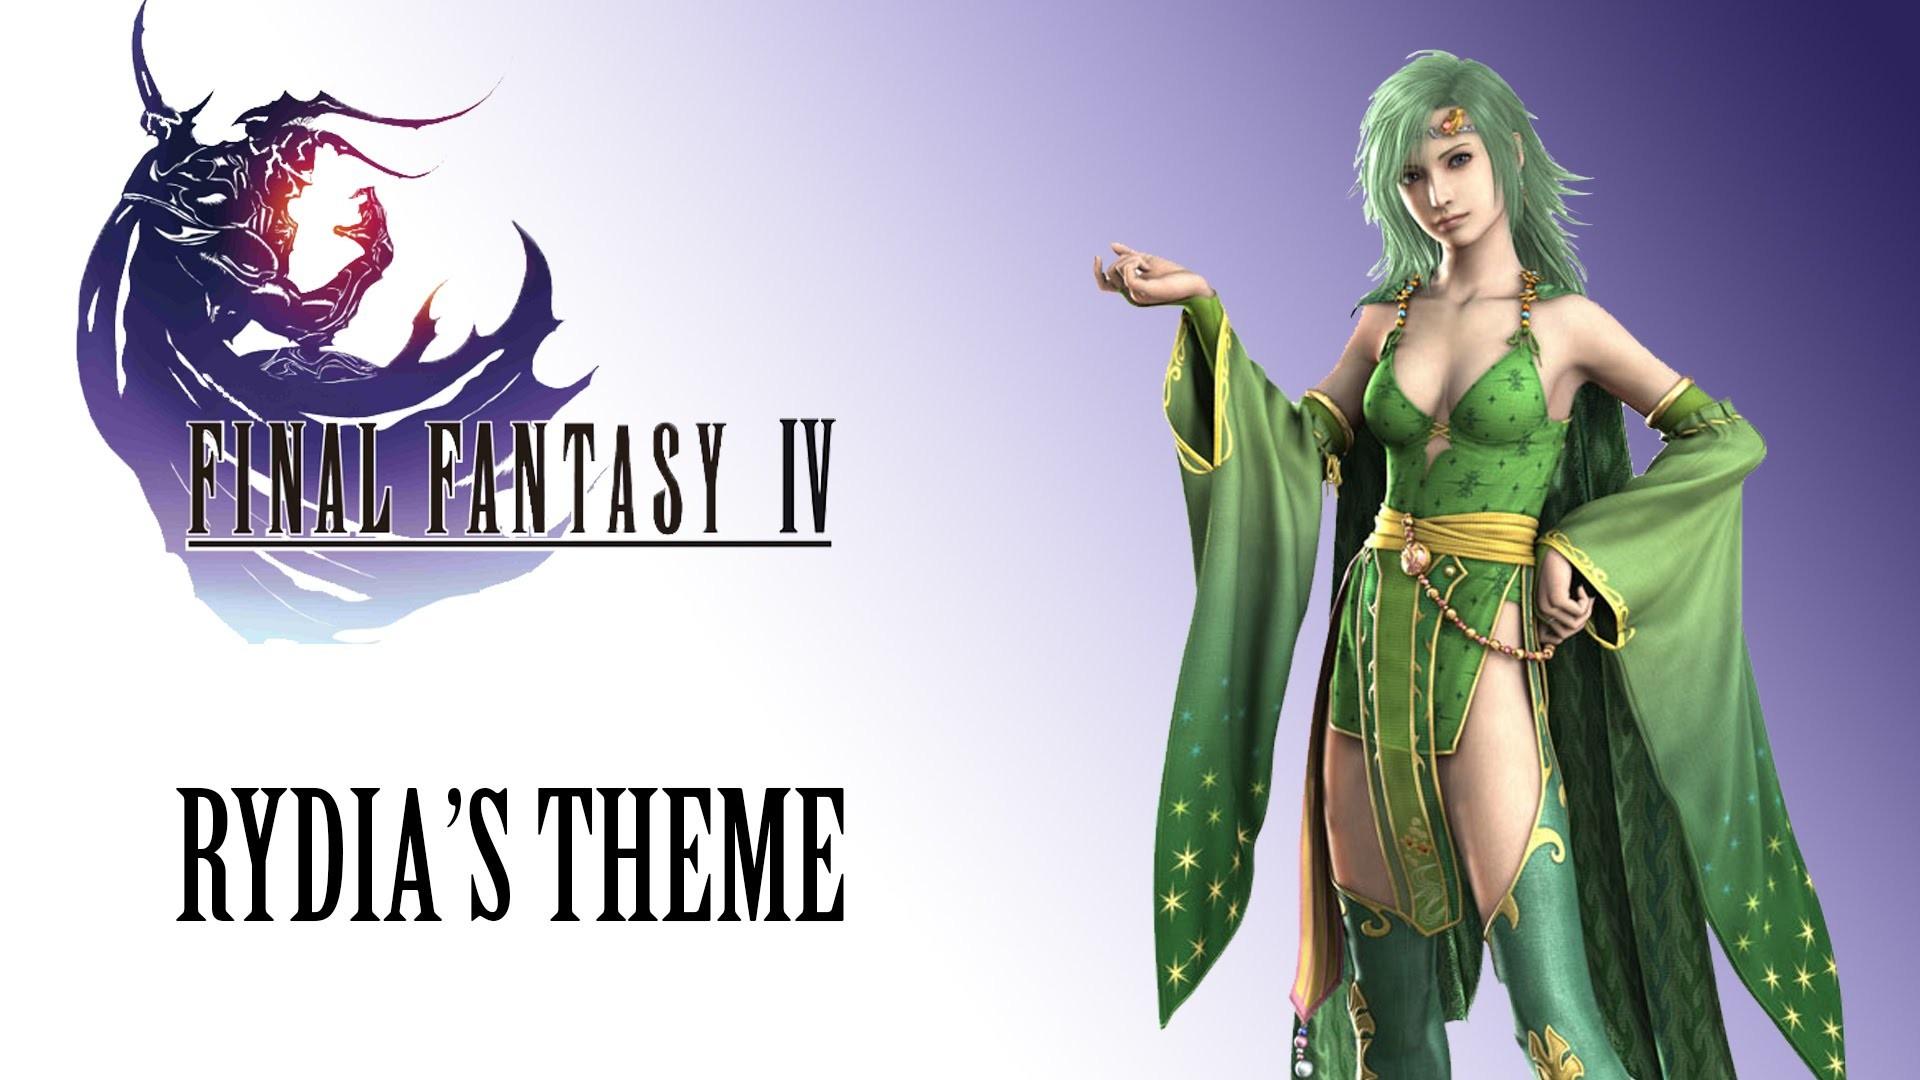 Final Fantasy IV OST Rydia 's Theme